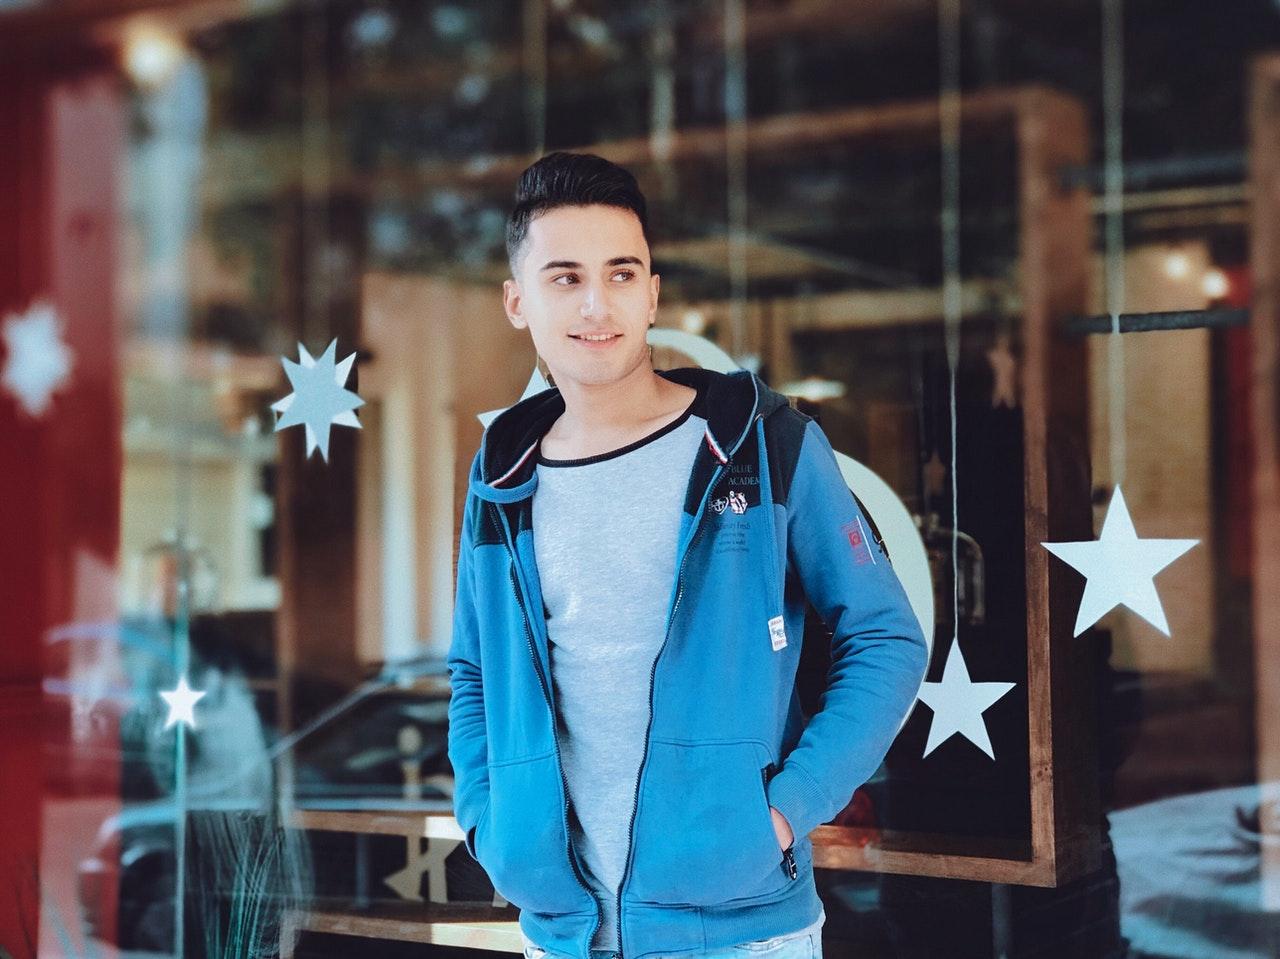 an attractive man standing